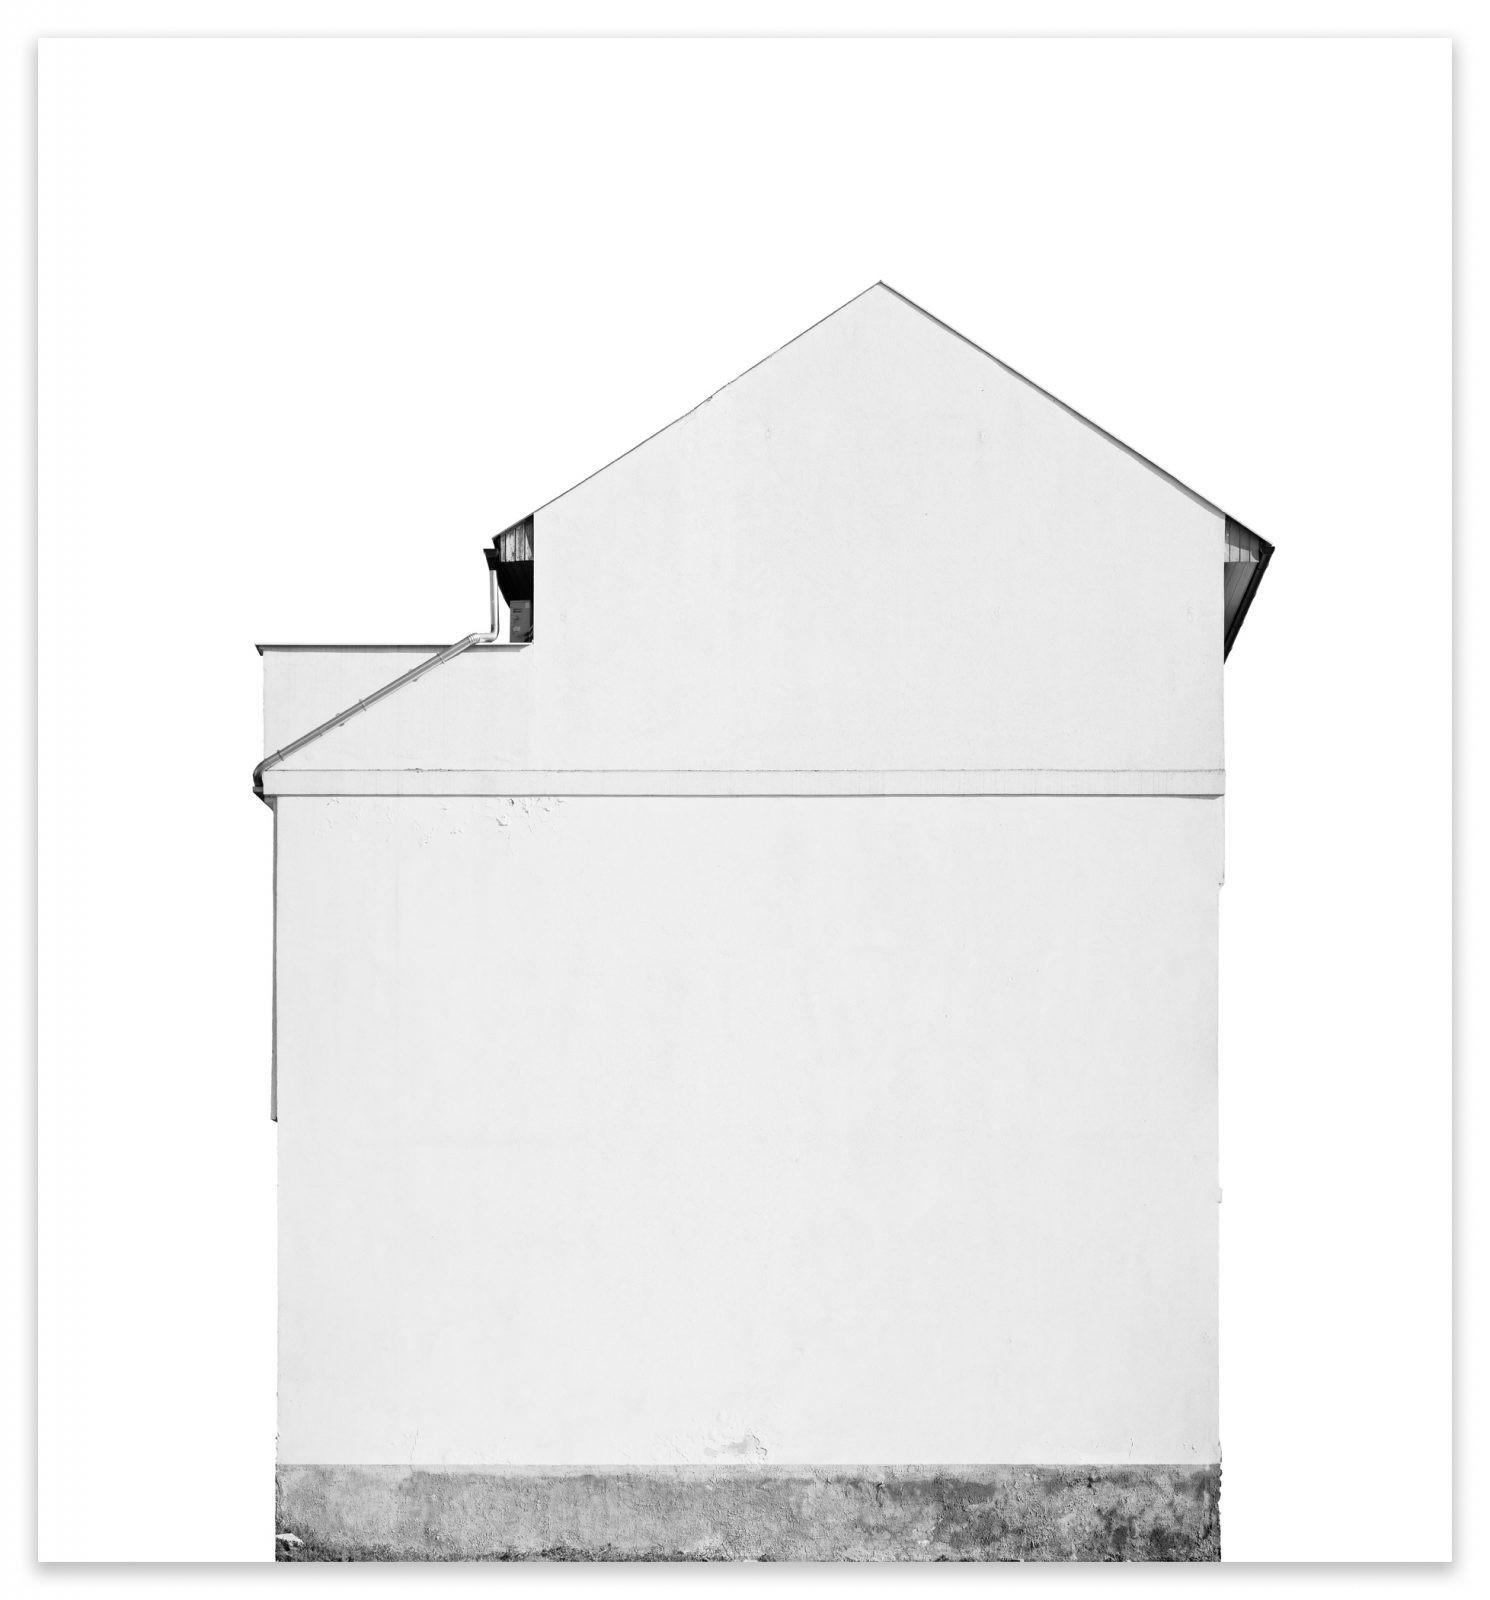 Akos Czigany: Home 1259-64